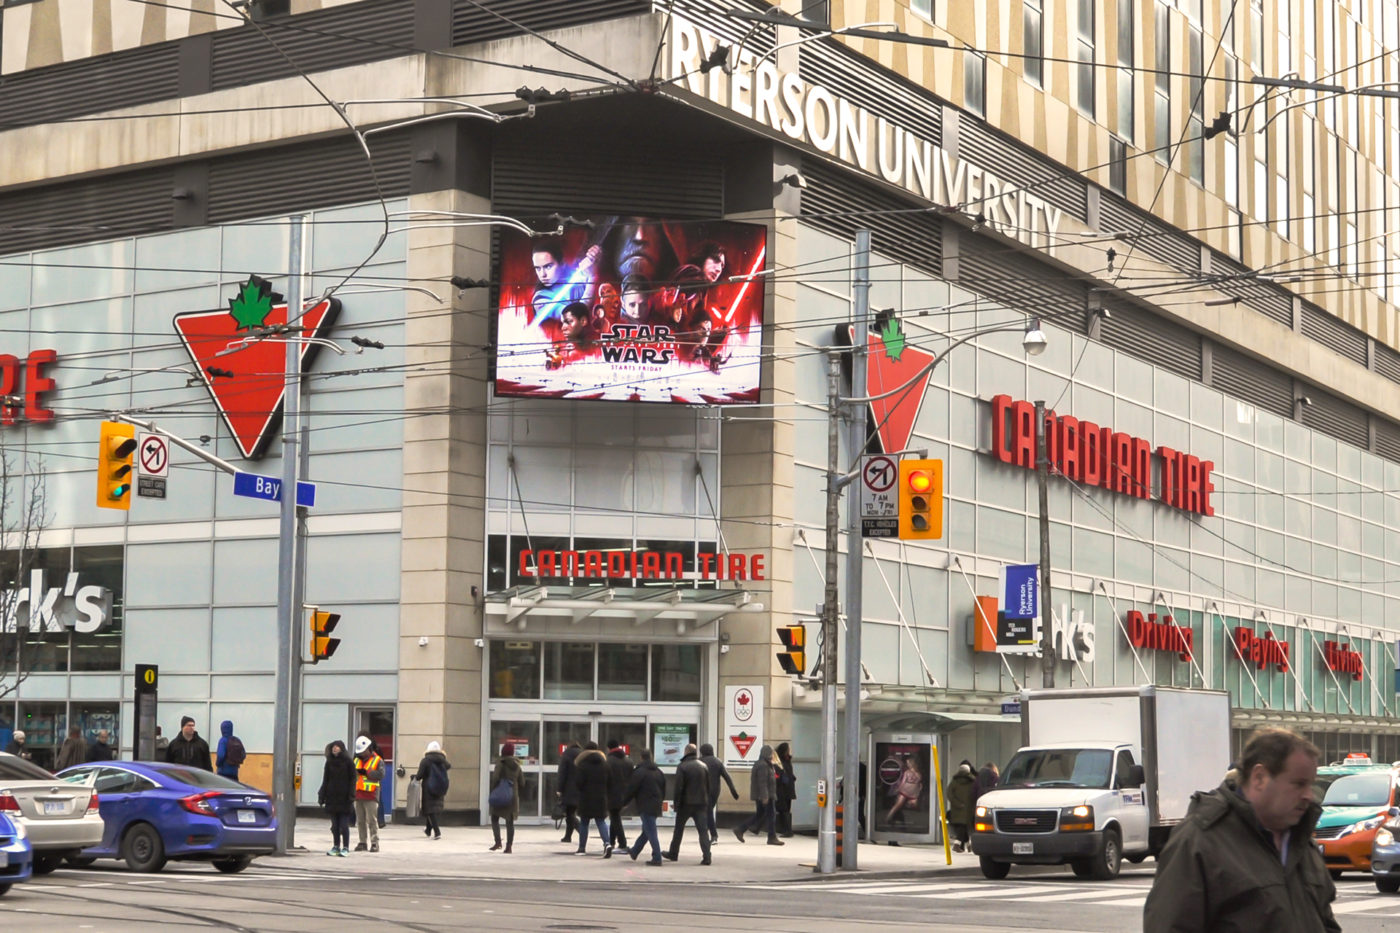 Star Wars - Malls - CF Toronto Eaton Centre - Exterior (Toronto, Ontario)